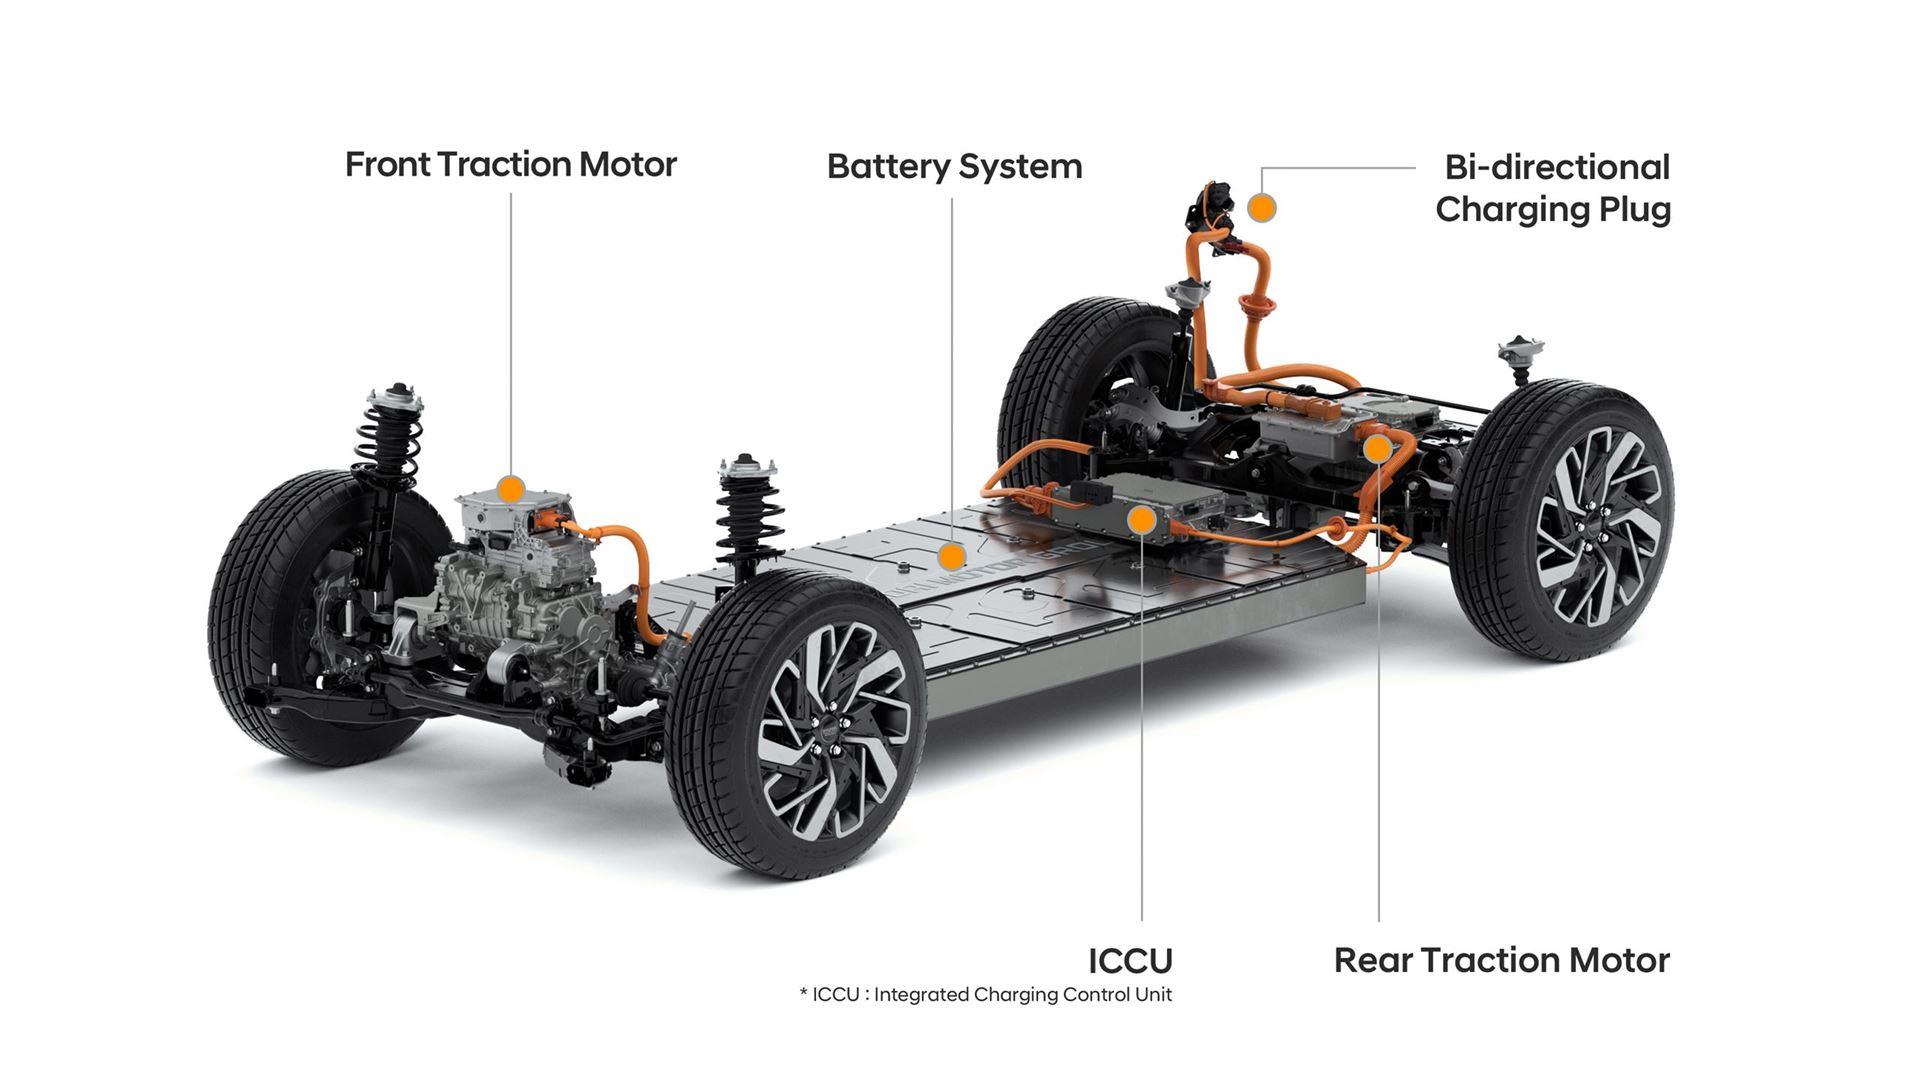 Hyundai Motor Group to Lead Charge into Electric Era with Dedicated EV Platform 'E-GMP' - Image 5